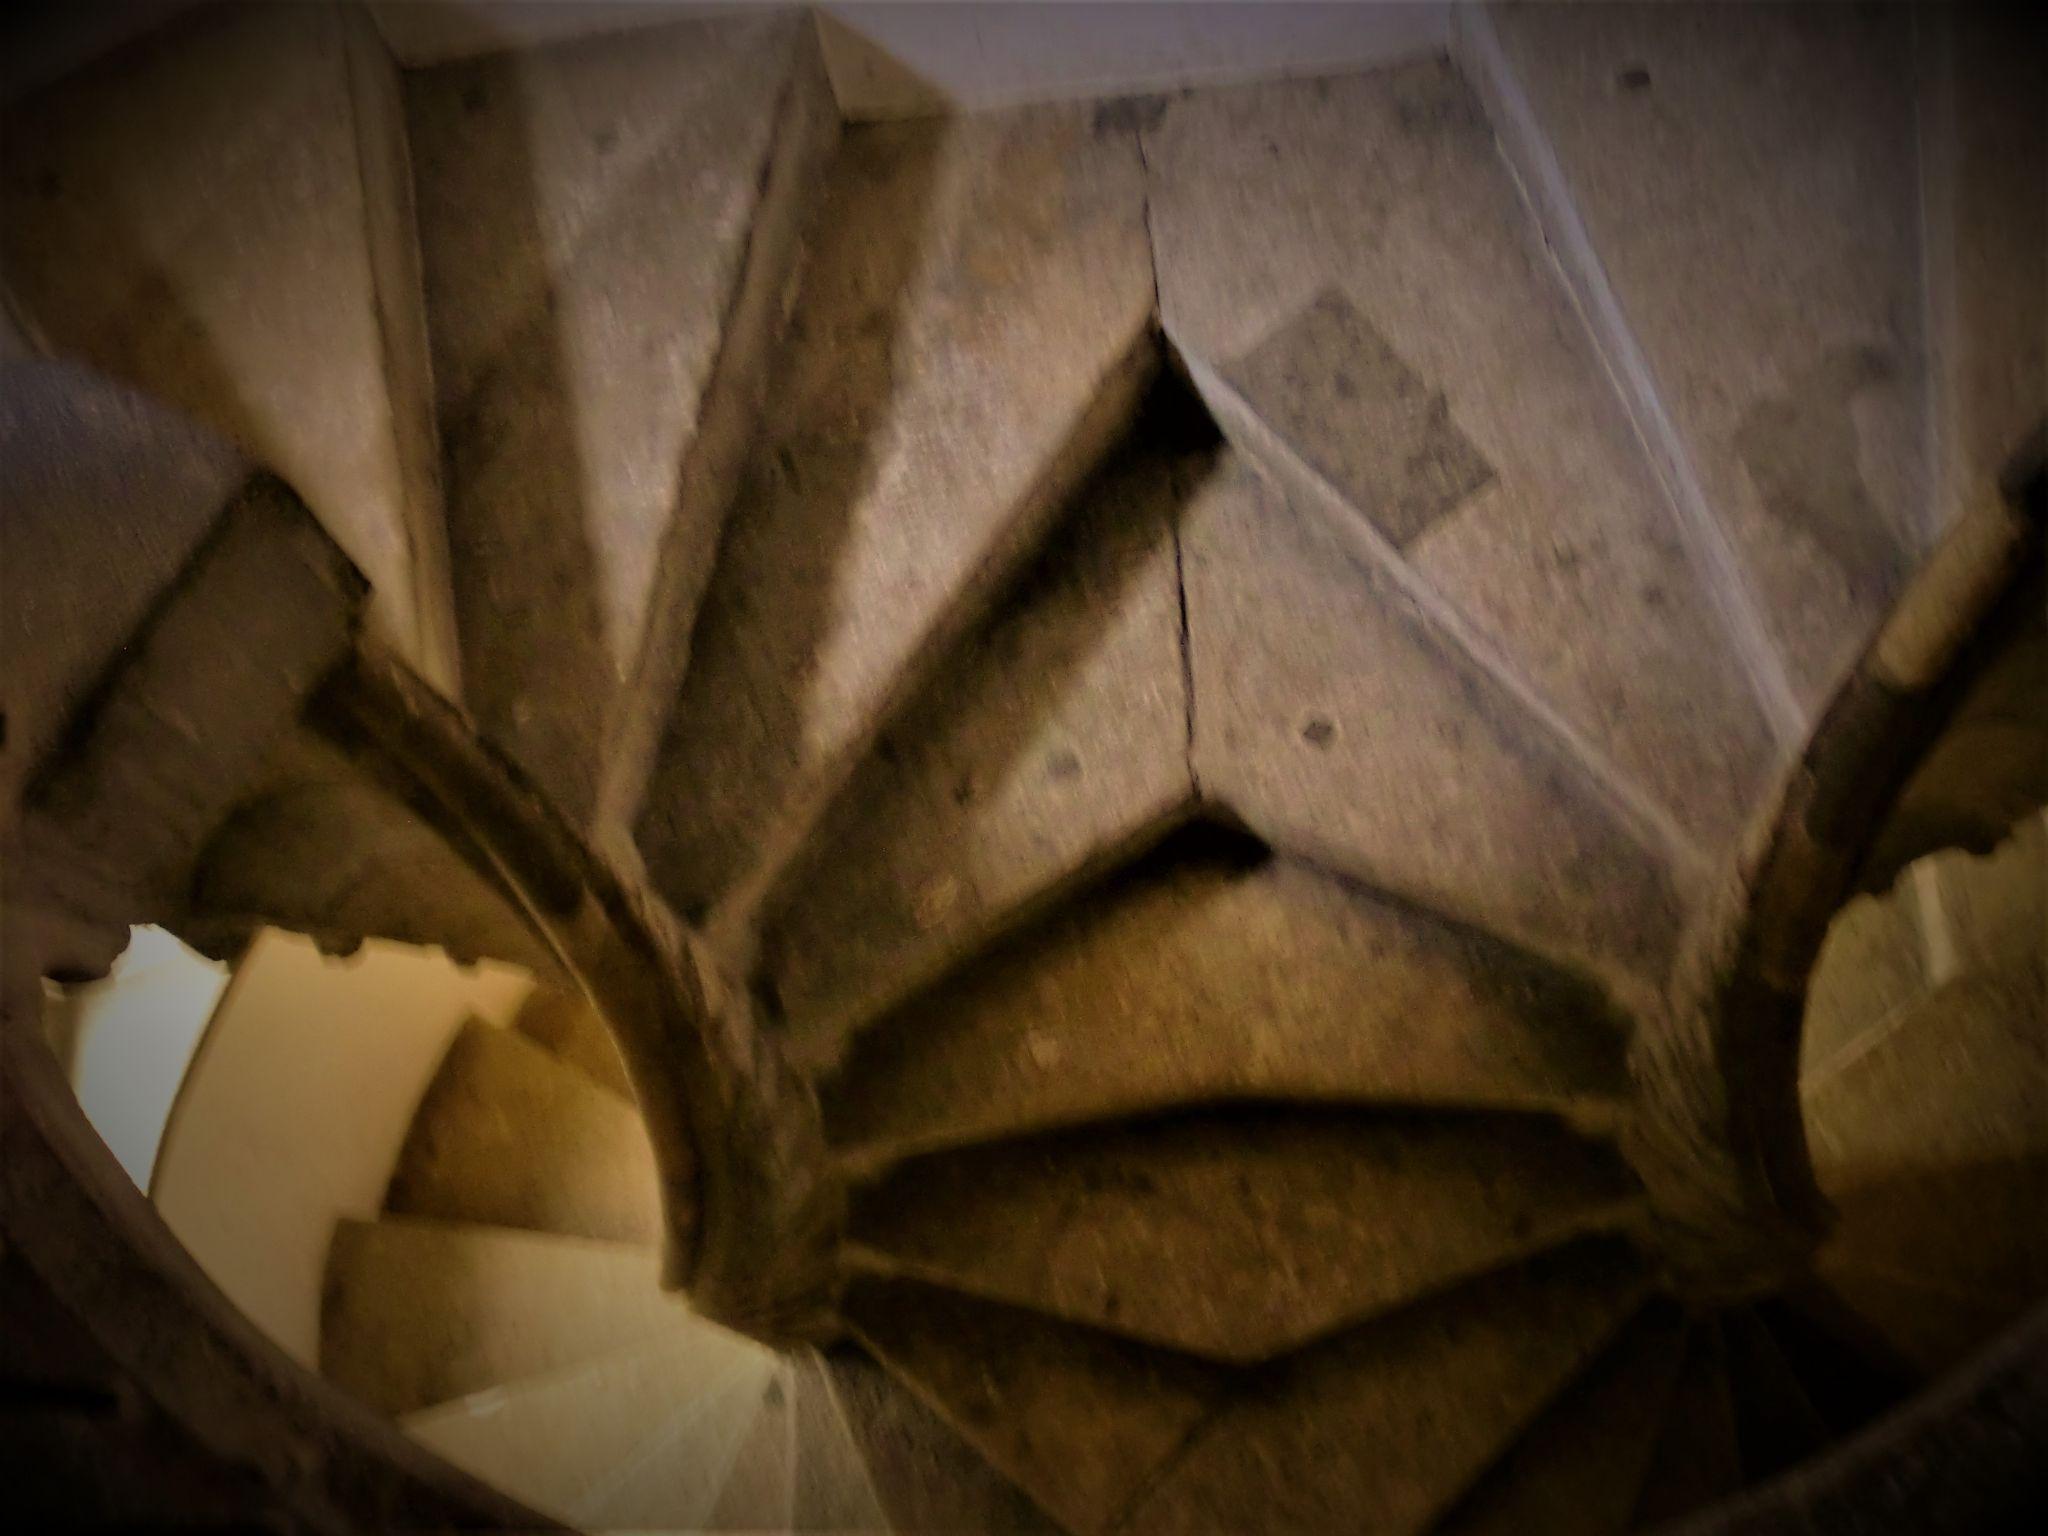 Graz region 3 - Graz: tradition and modernity